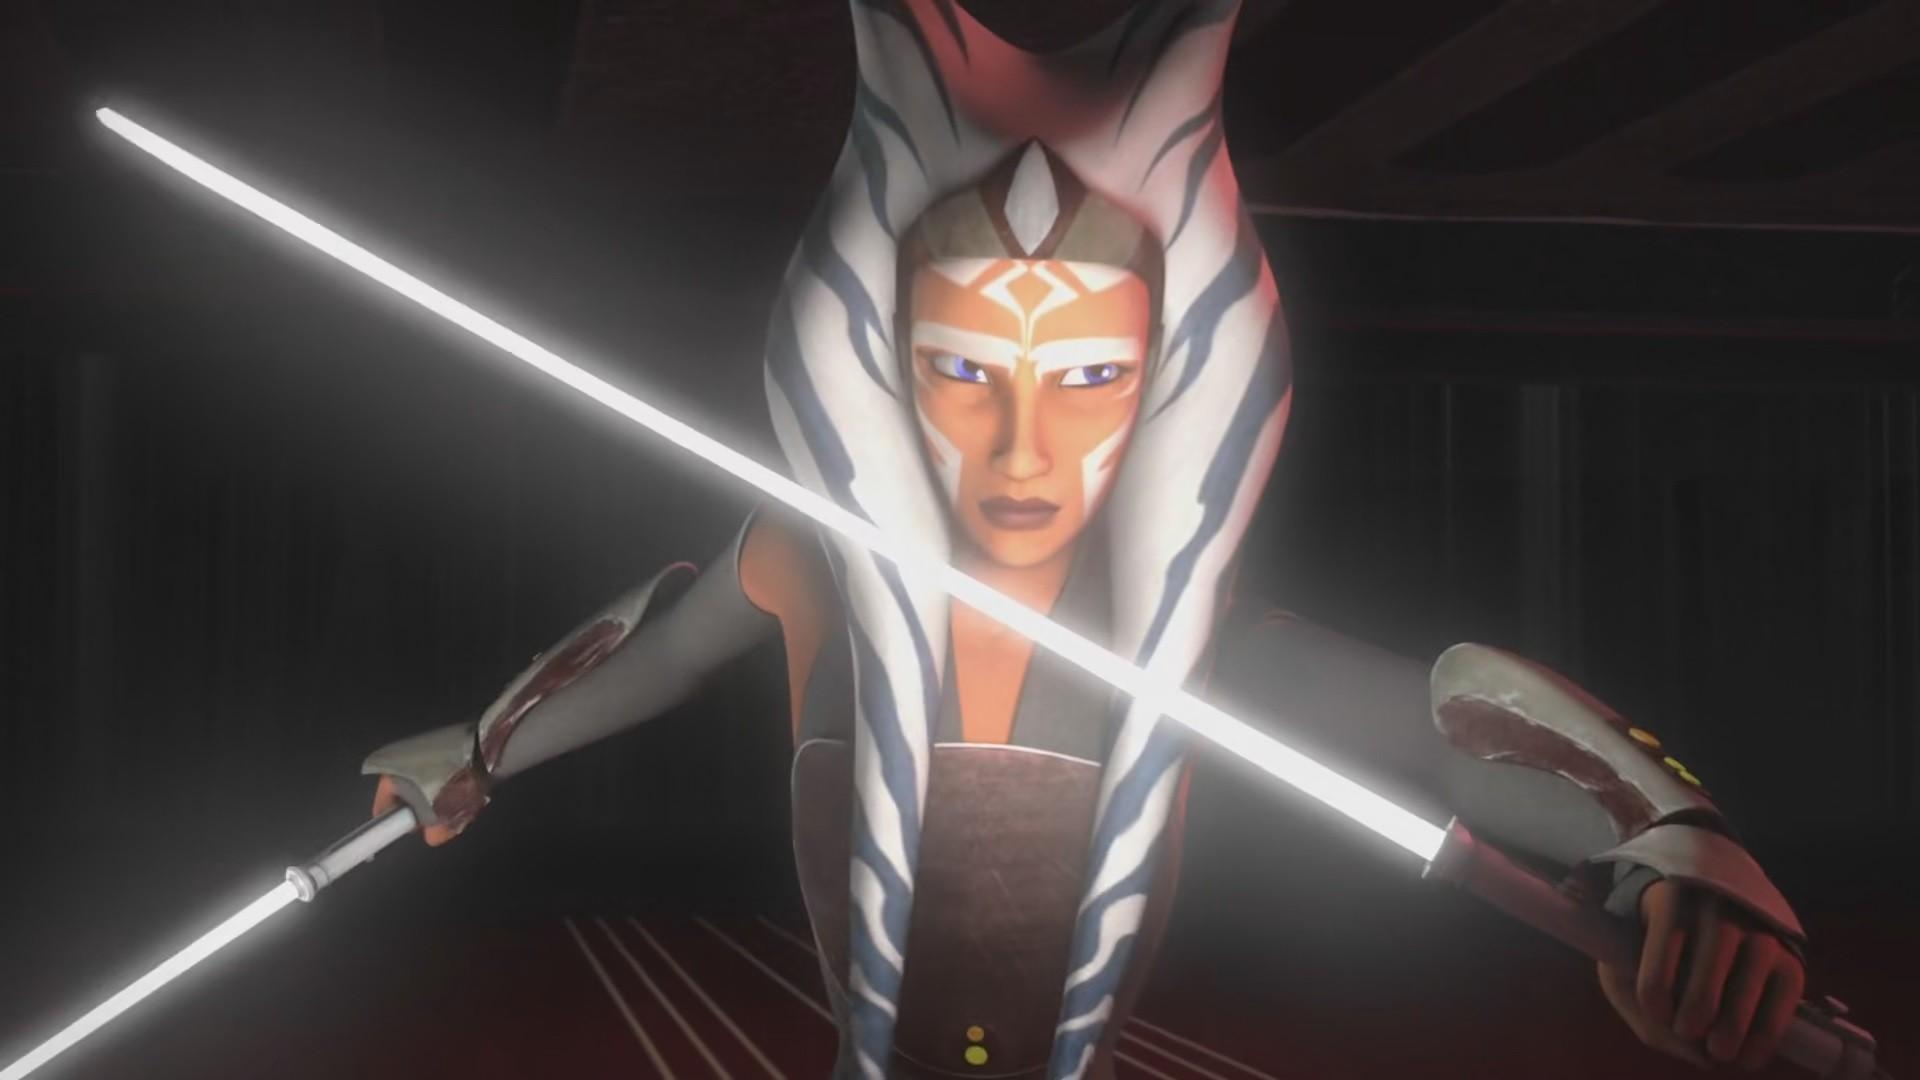 Wallpaper Anime Star Wars Rebels Ahsoka Tano Screenshot